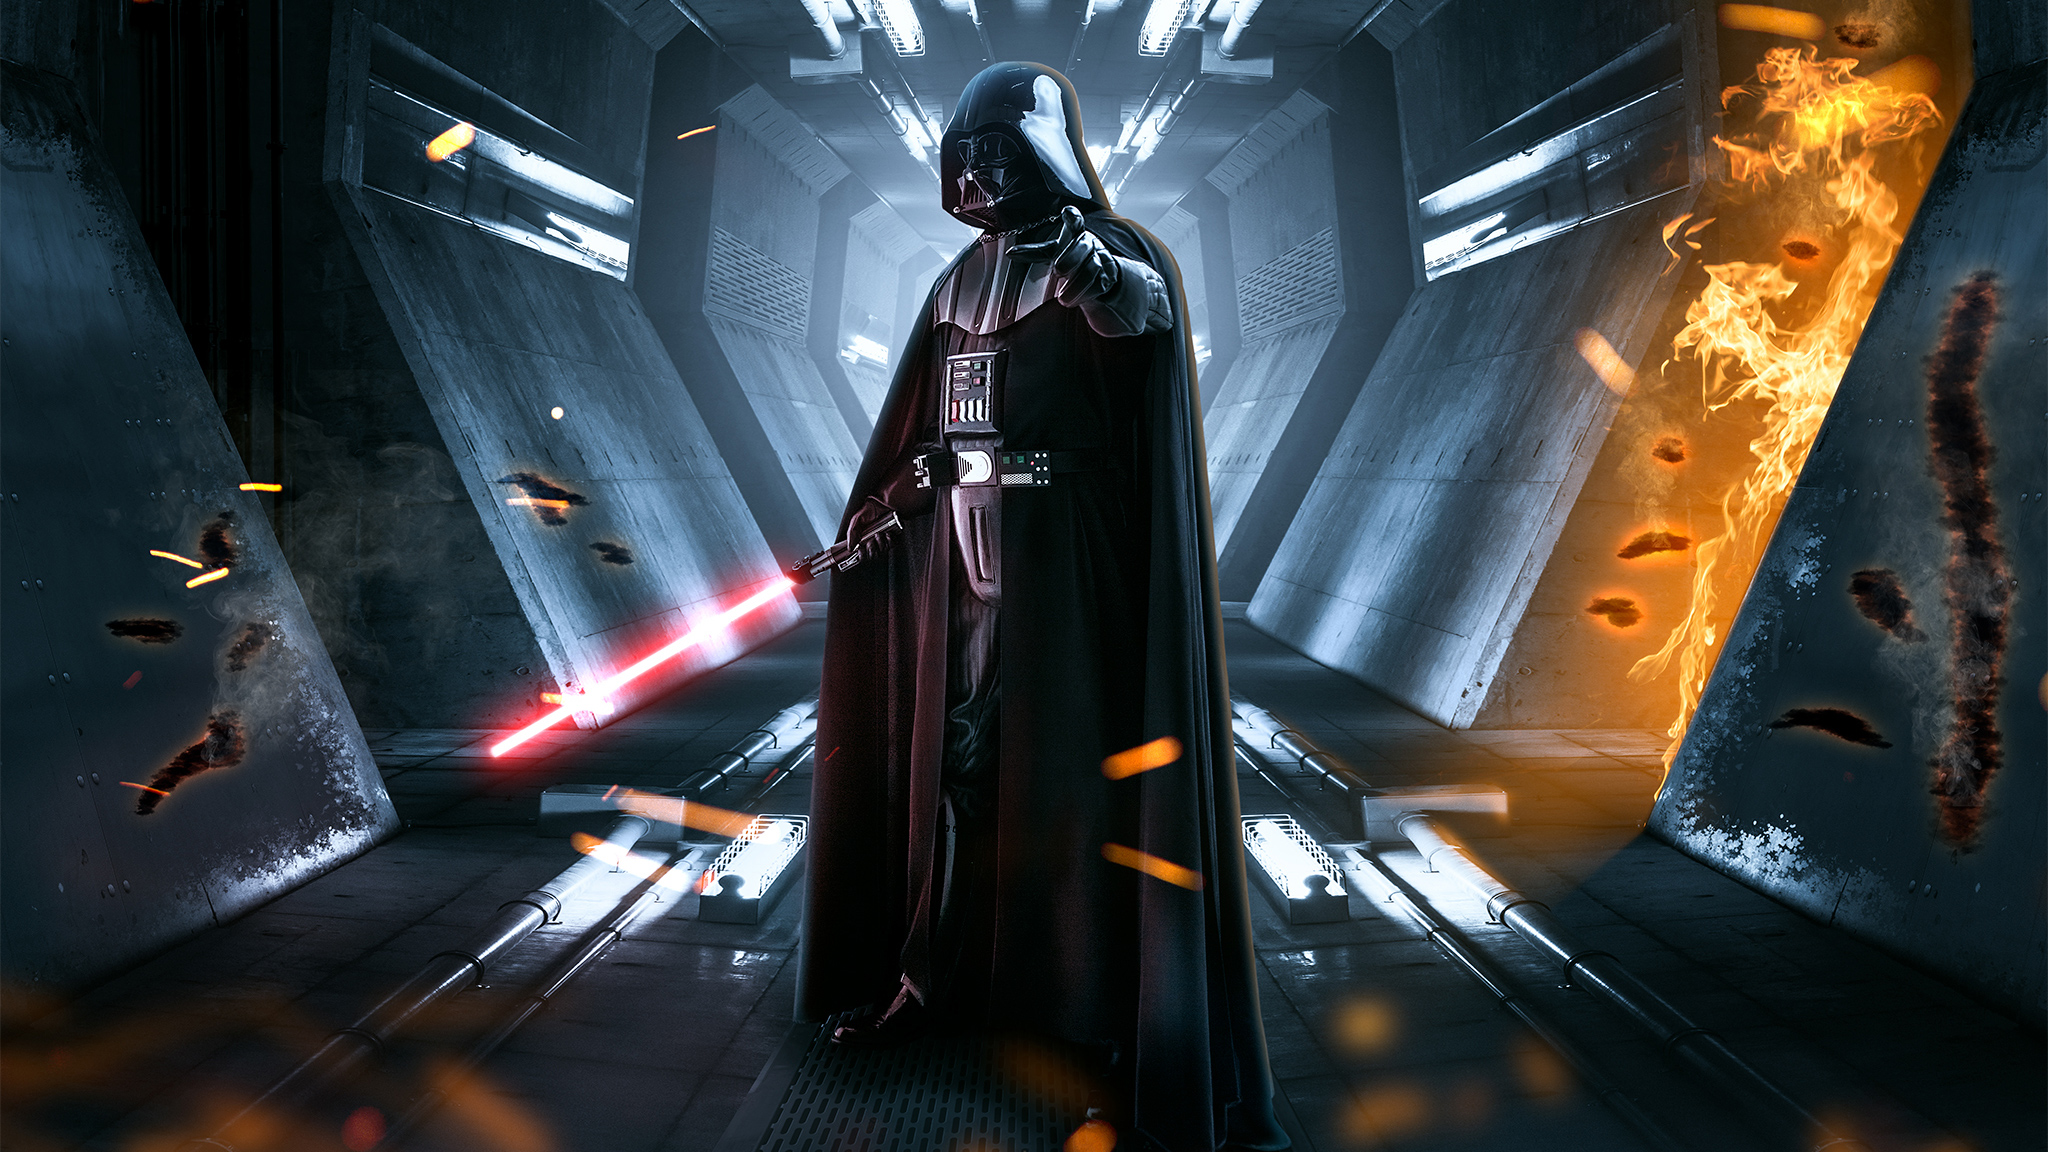 Star Wars Hd Wallpaper Background Image 2048x1152 Id 1003732 Wallpaper Abyss